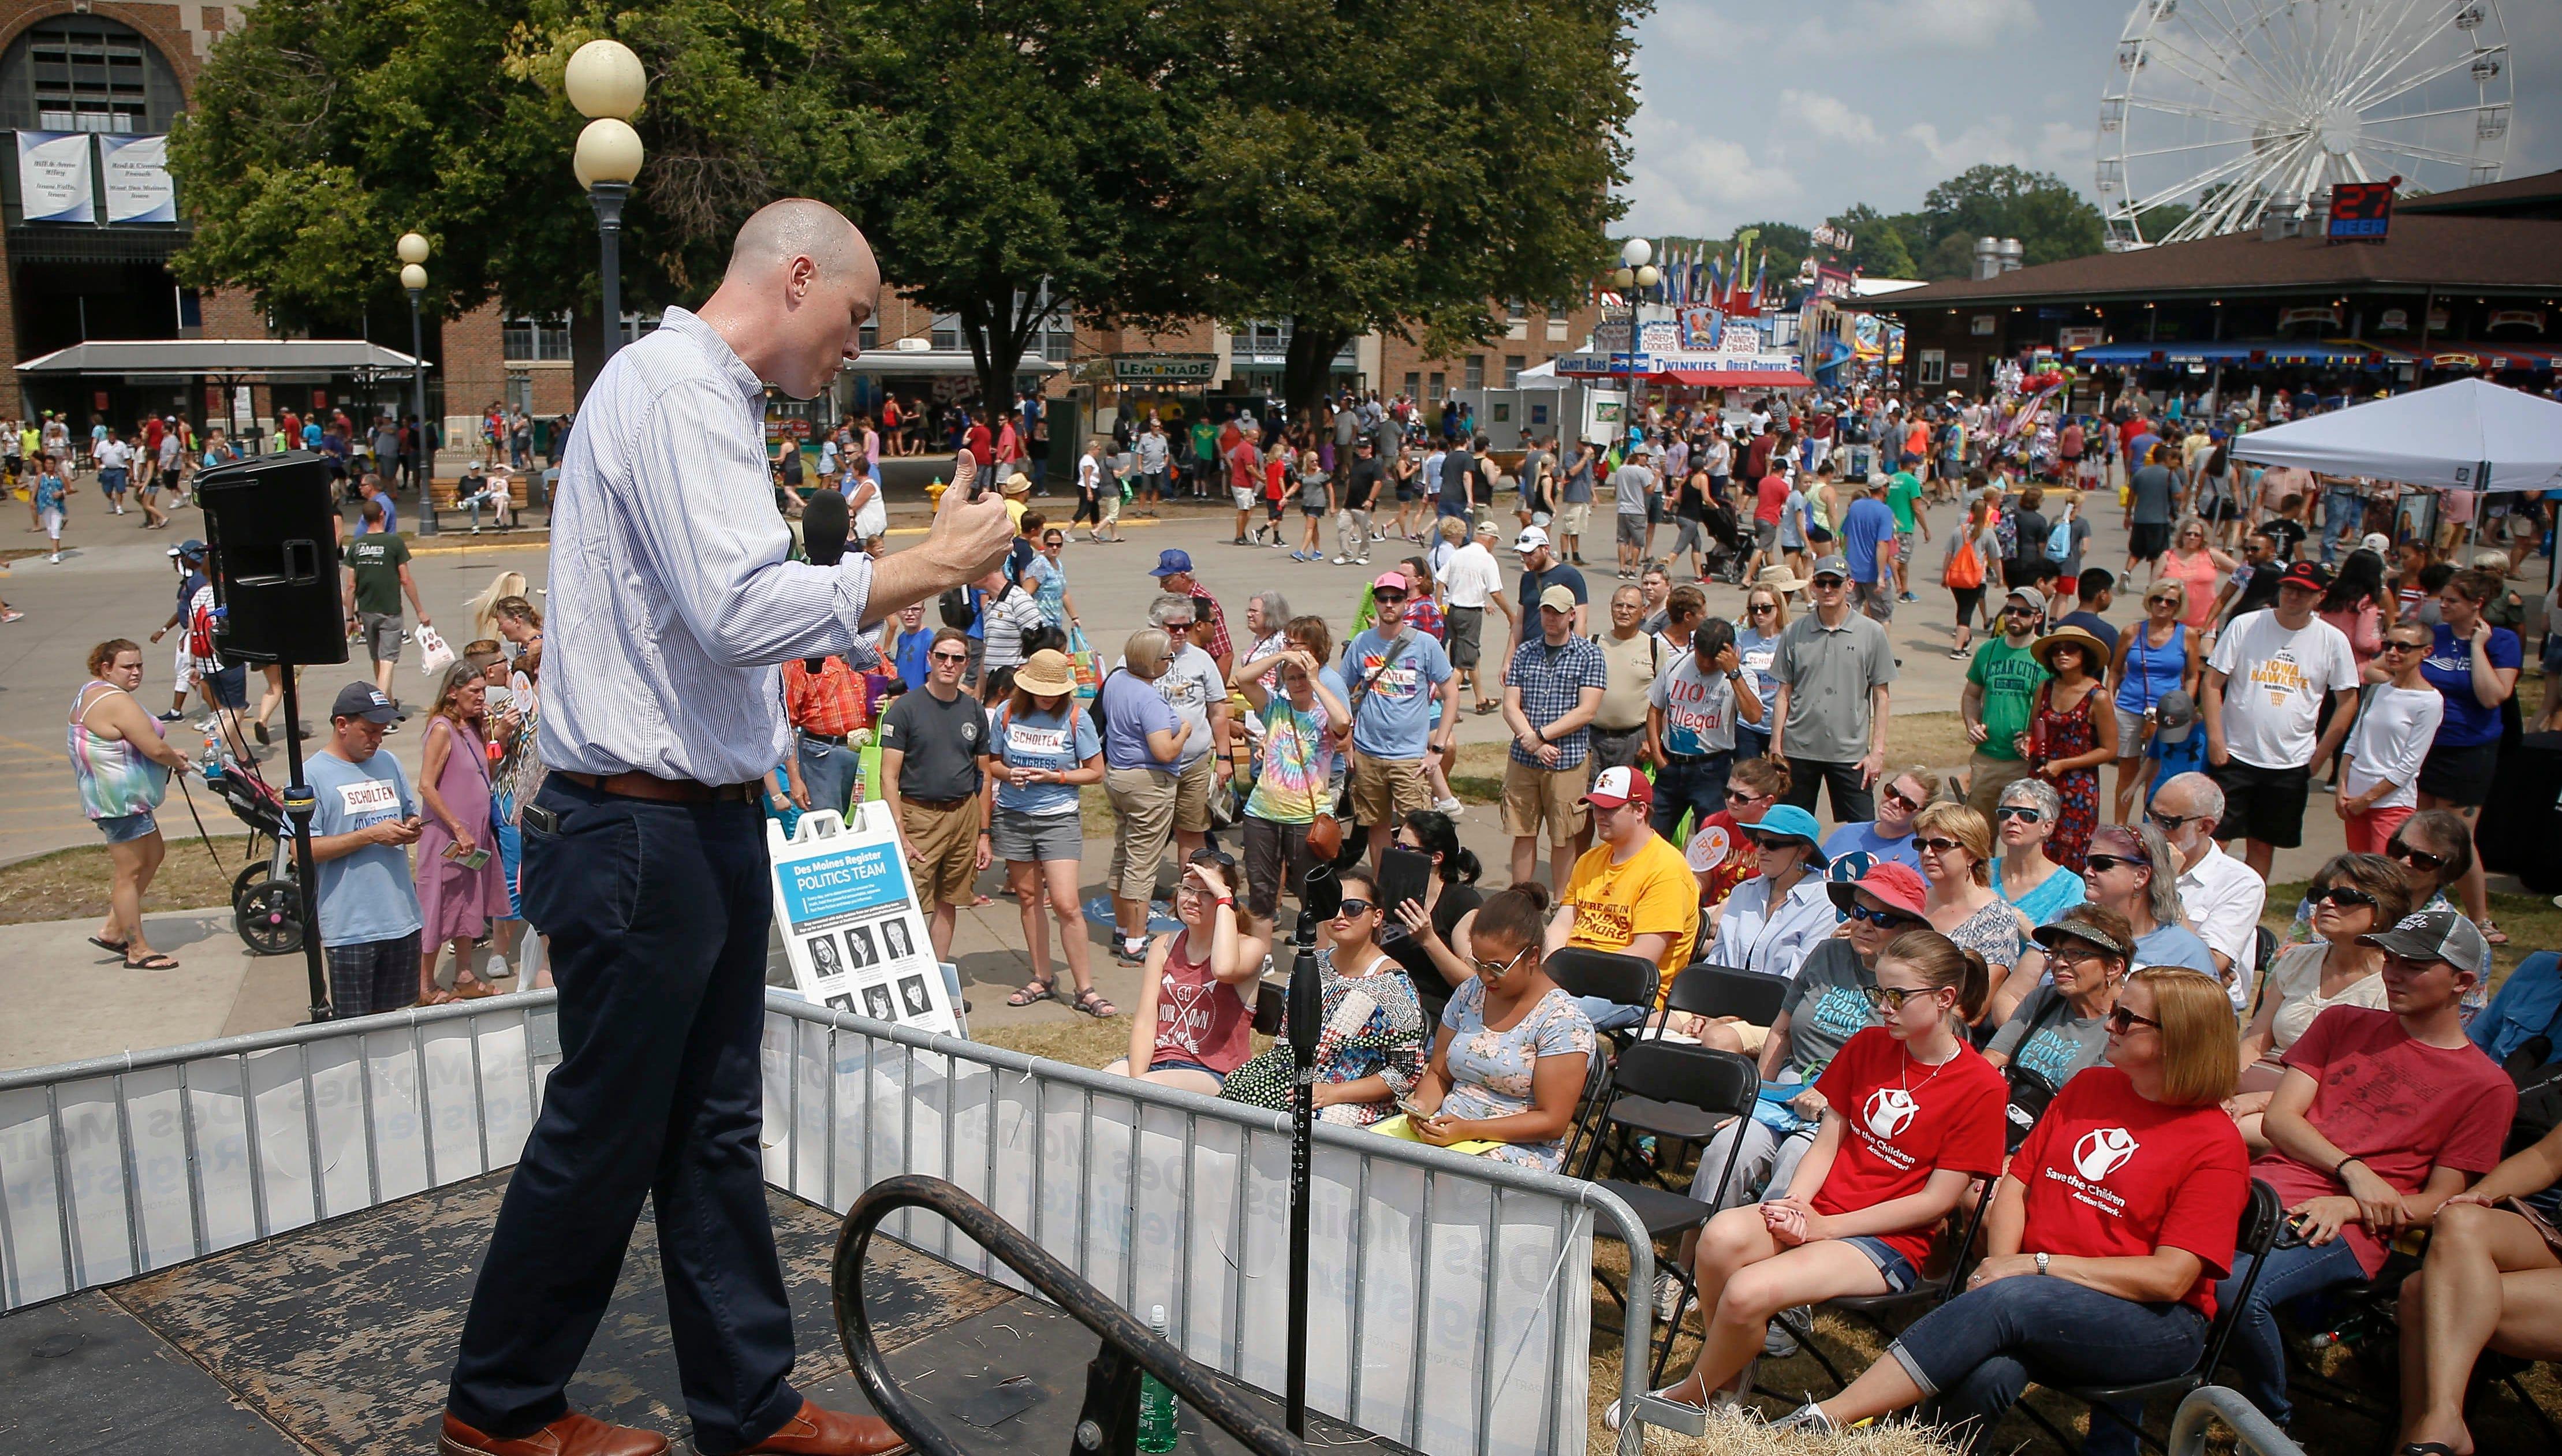 Democratic candidate J.D. Scholten focuses on tariffs, agriculture at Soapbox speech